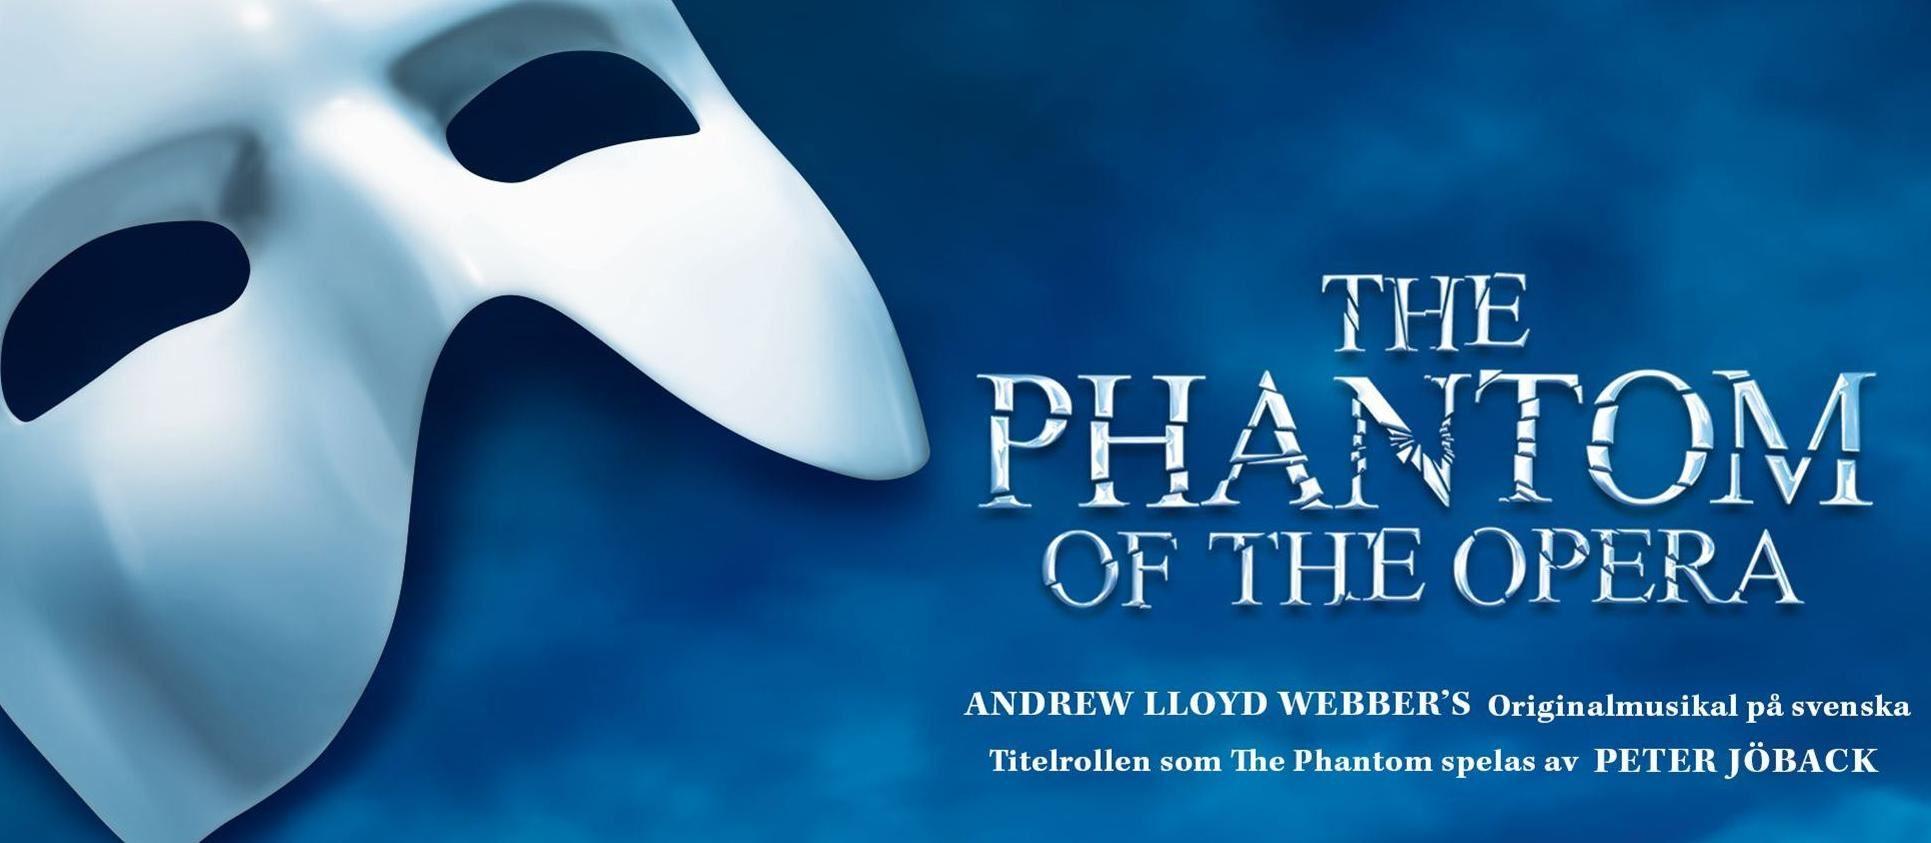 Teaterresa med Ludvika teaterförening - The Phantom of the Opera